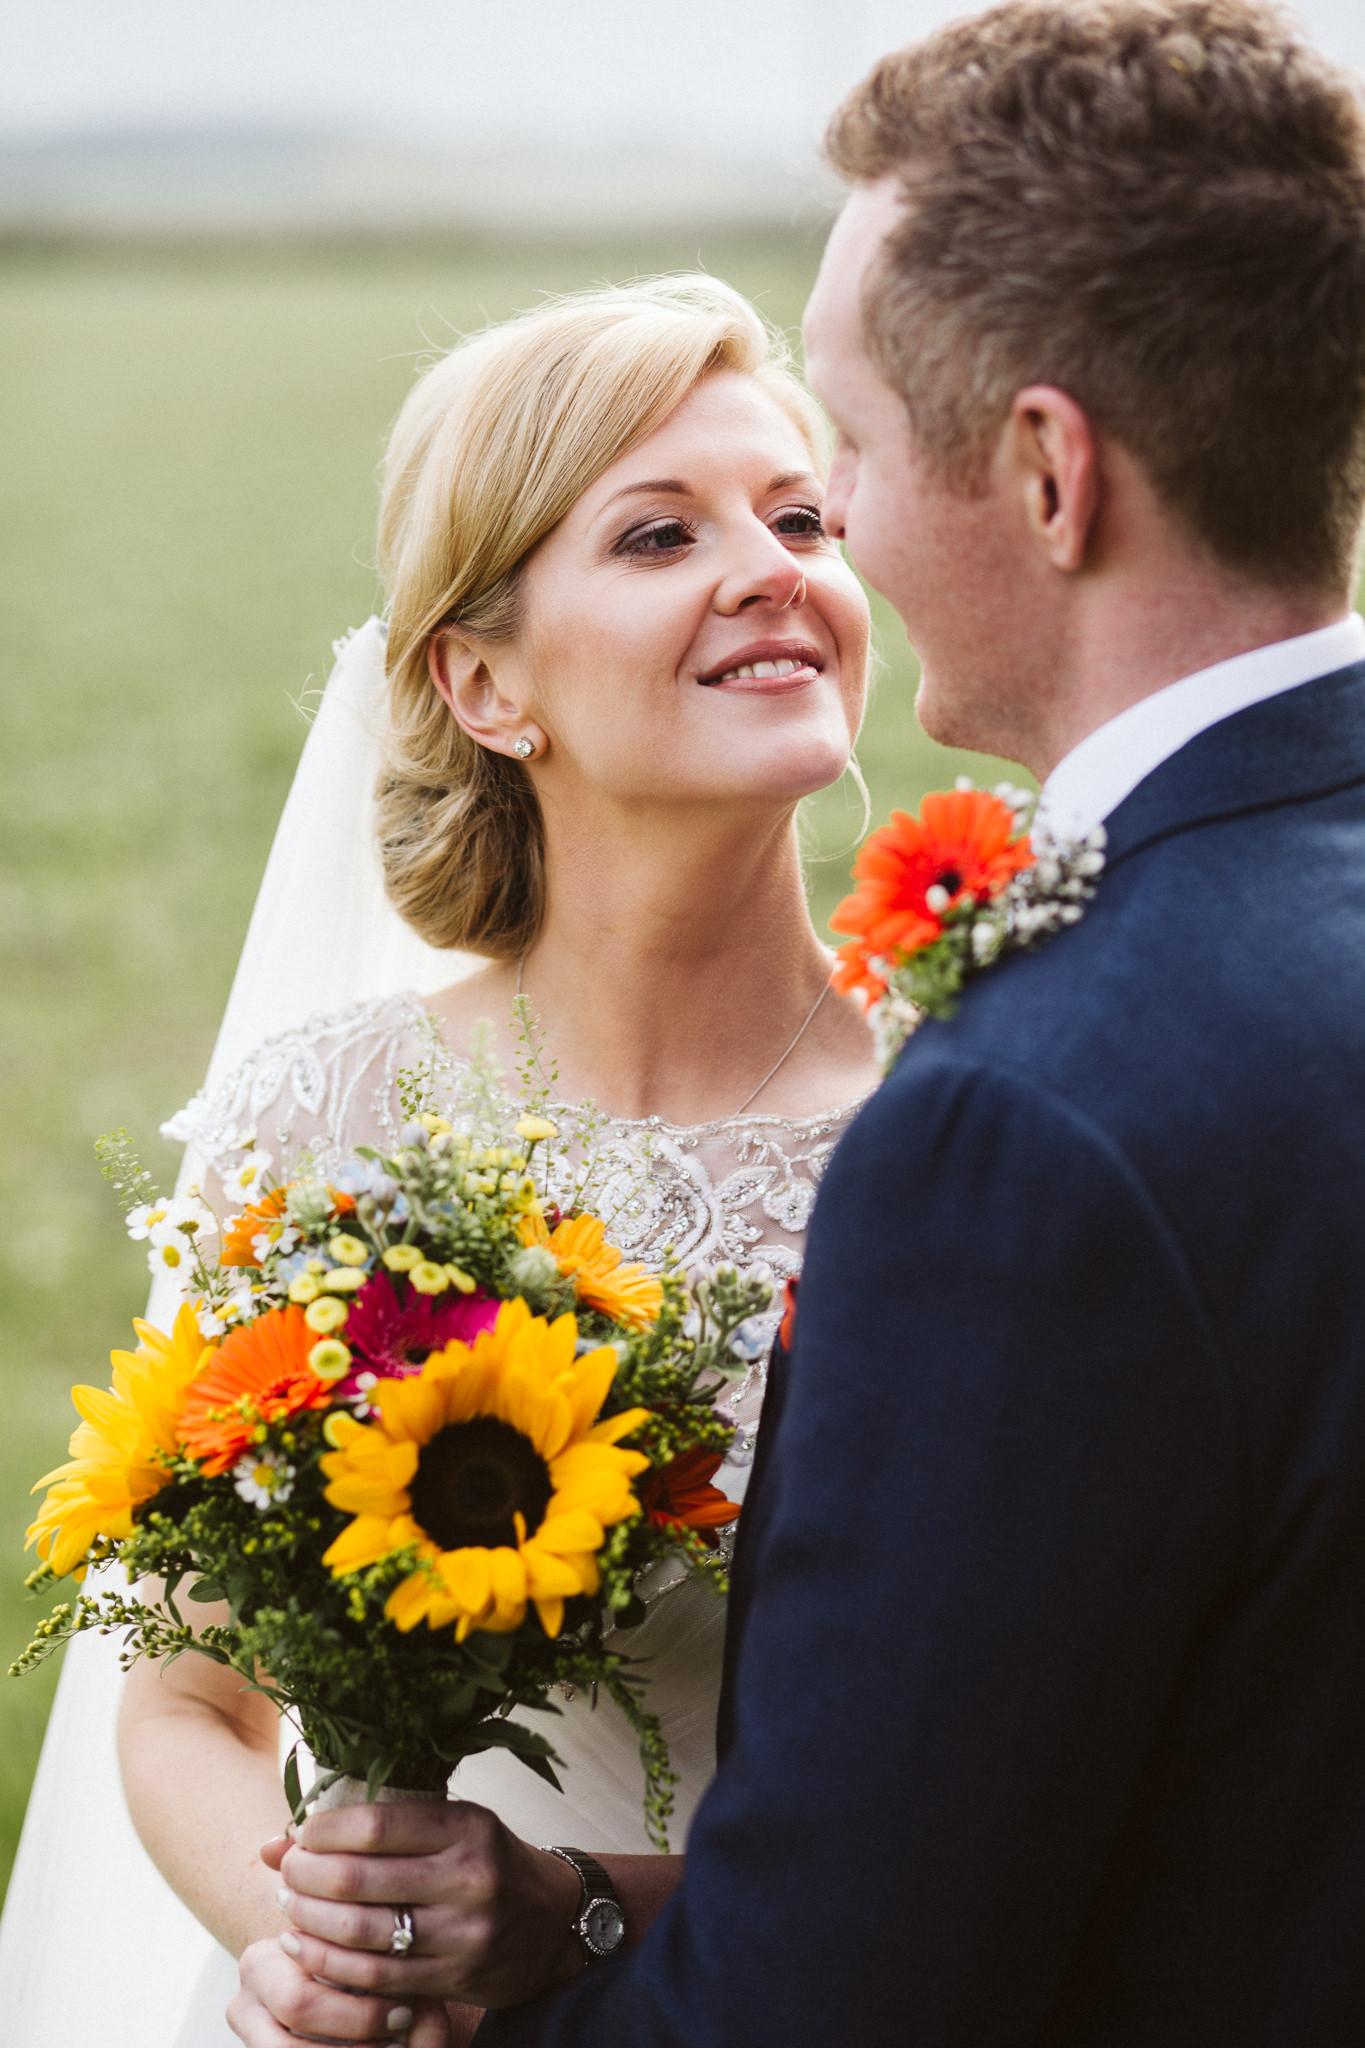 northside-farm-wedding-northumberland-margarita-hope (80).jpg